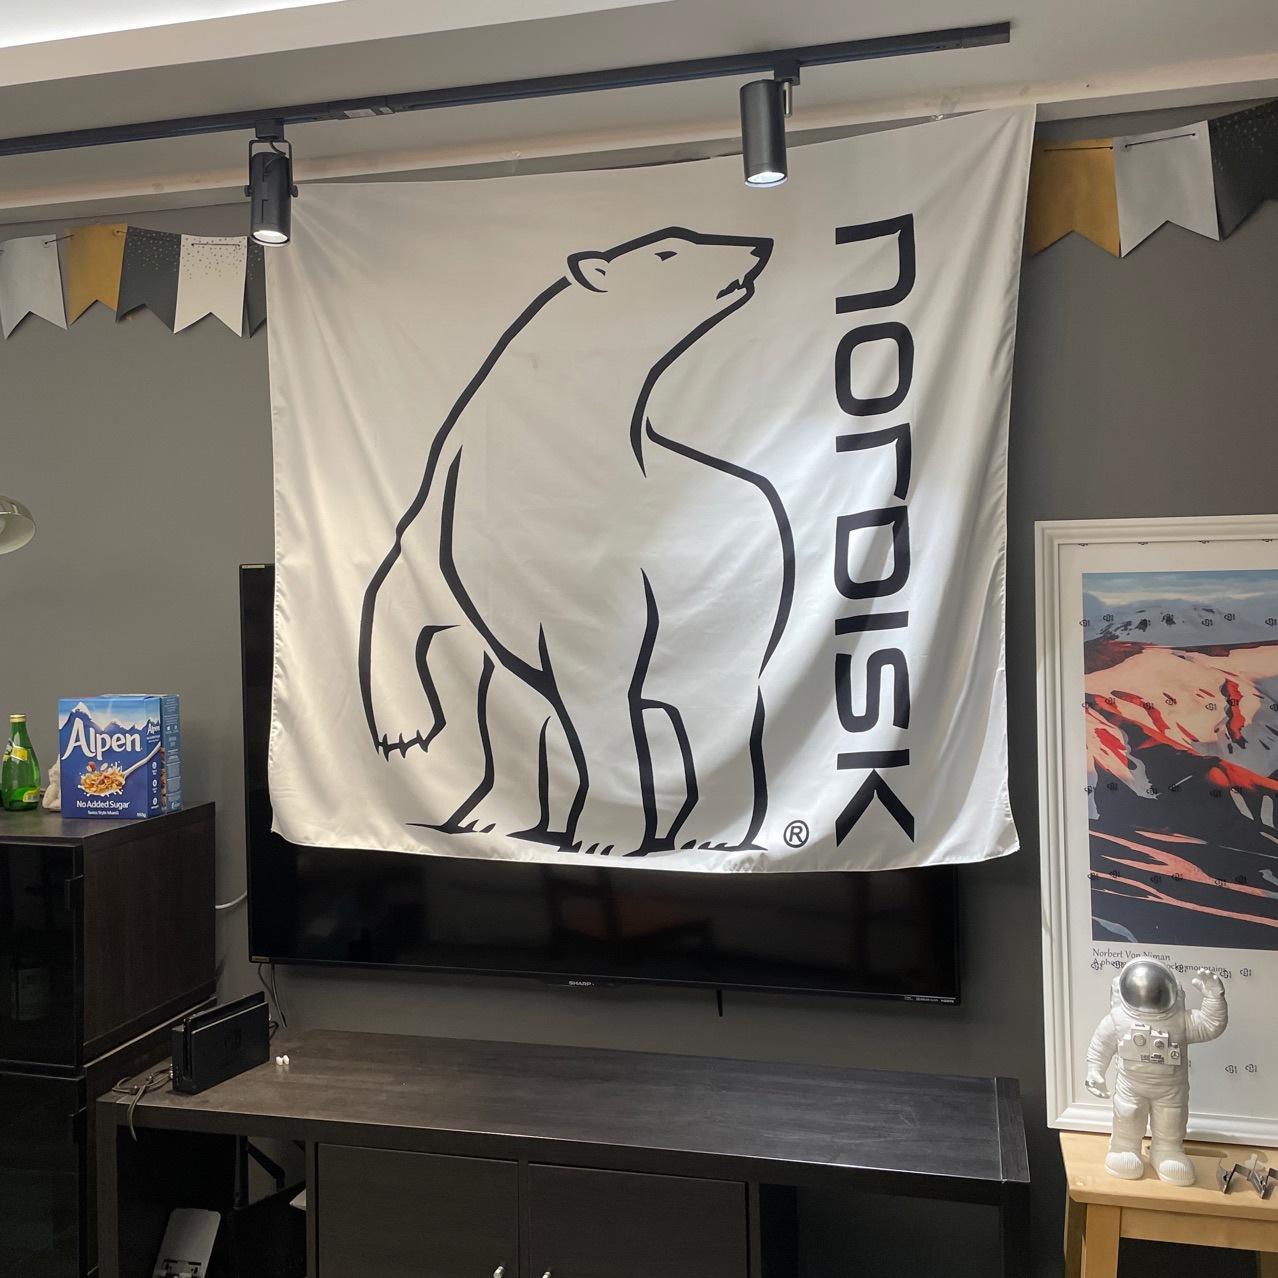 Nordisk戶外掛布掛毯 露營掛布 帳篷掛布掛毯裝飾布  北極熊 130*150